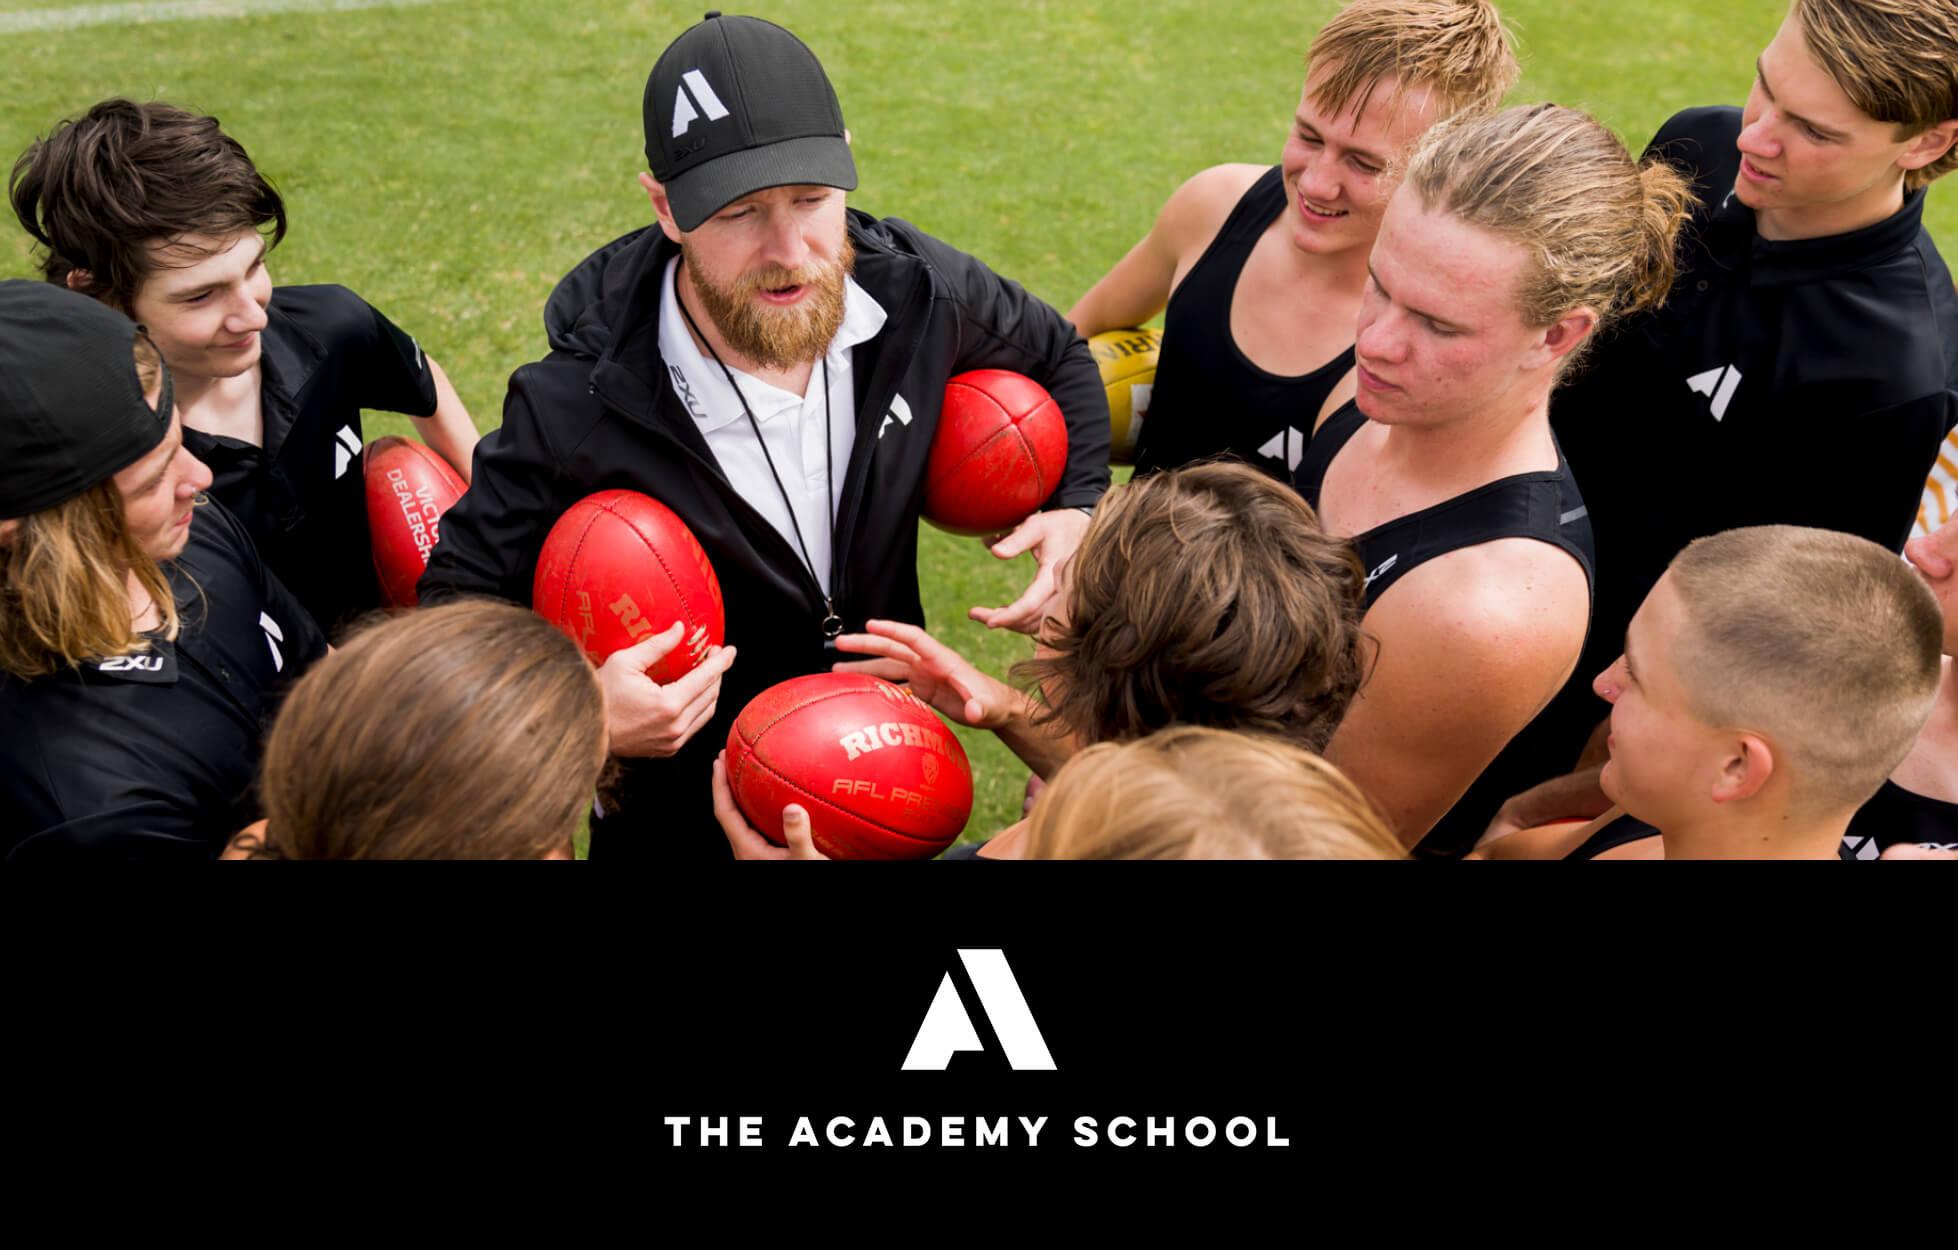 academyschool1.jpg